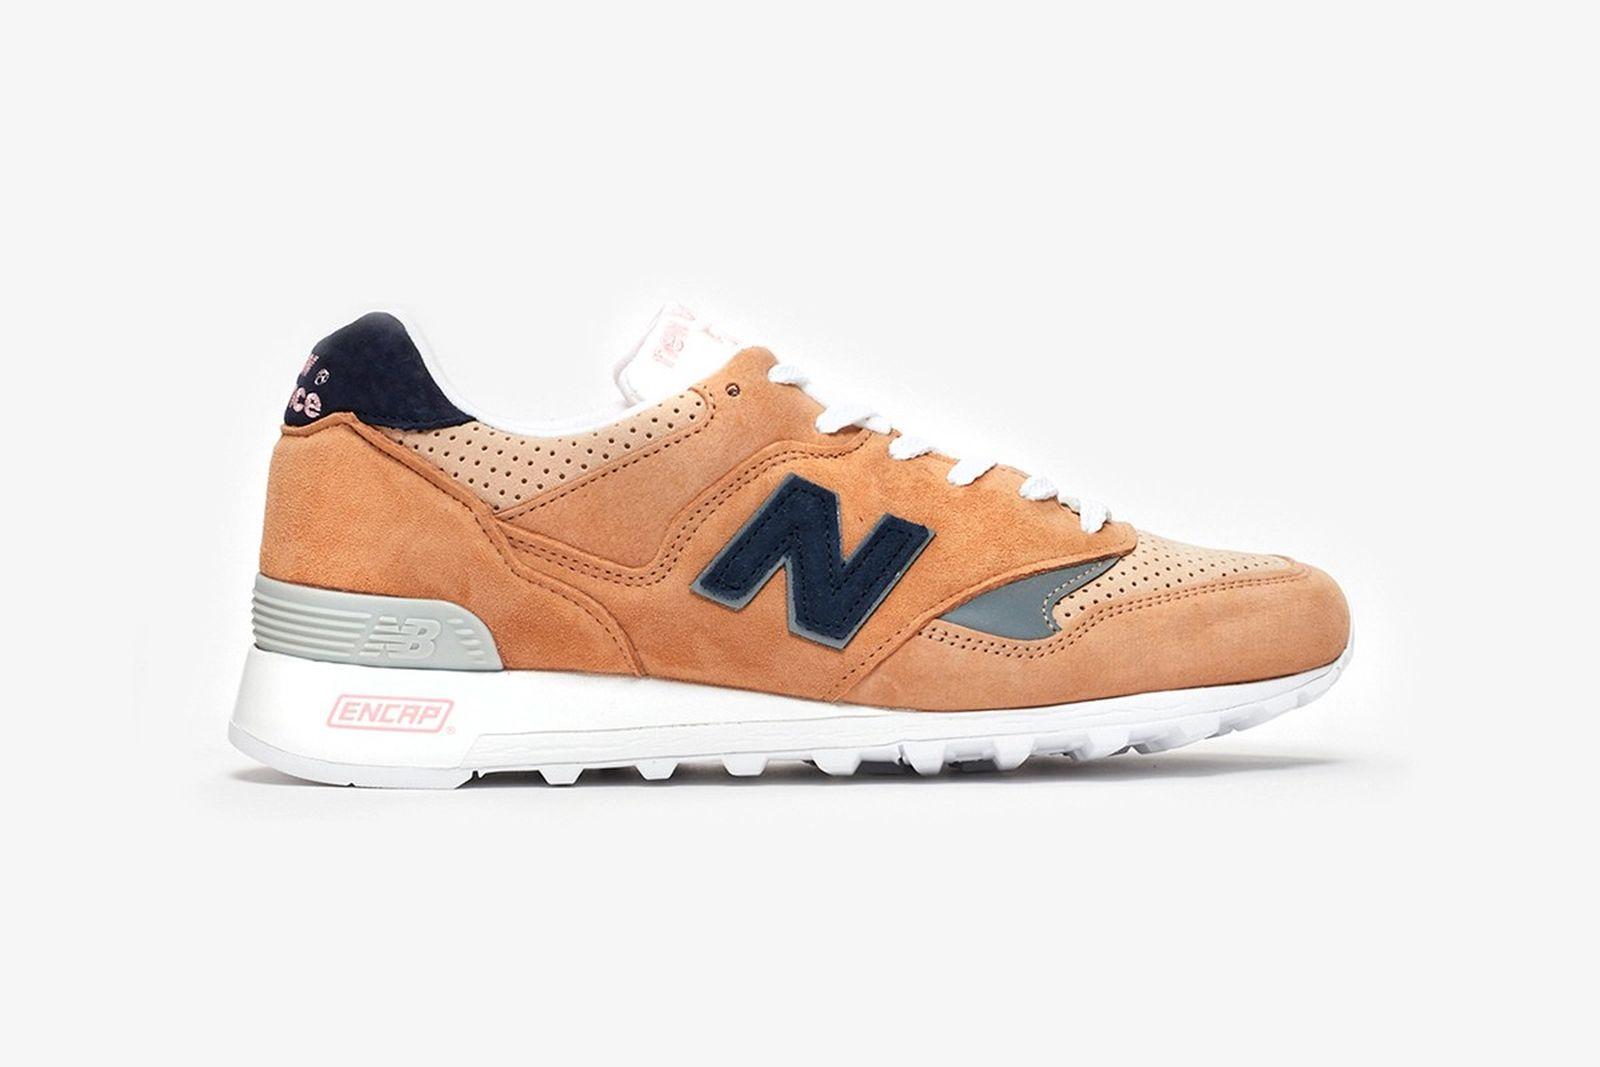 sneakersnstuff-new-balance-577-grown-up-release-date-price-1-02